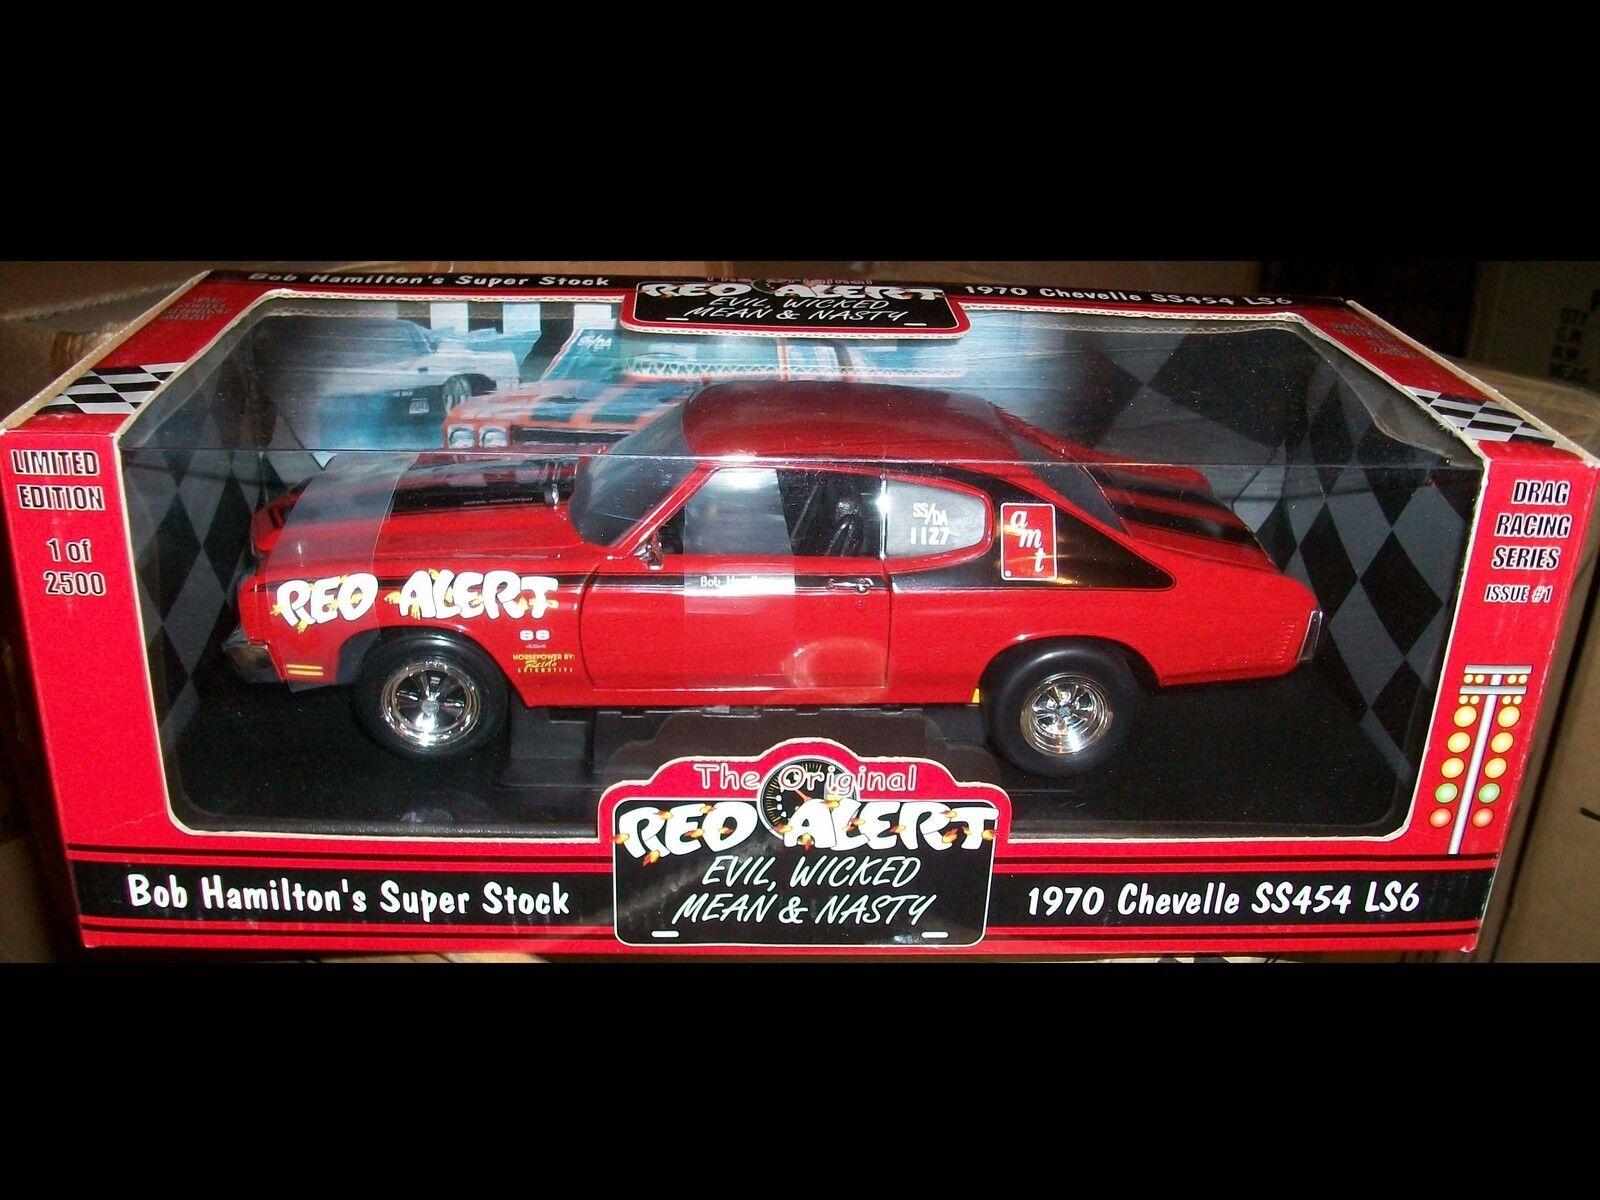 1970 Chevelle rouge Alert Bob Hamilton 1 2500 1 18 Ertl American Muscle 29108